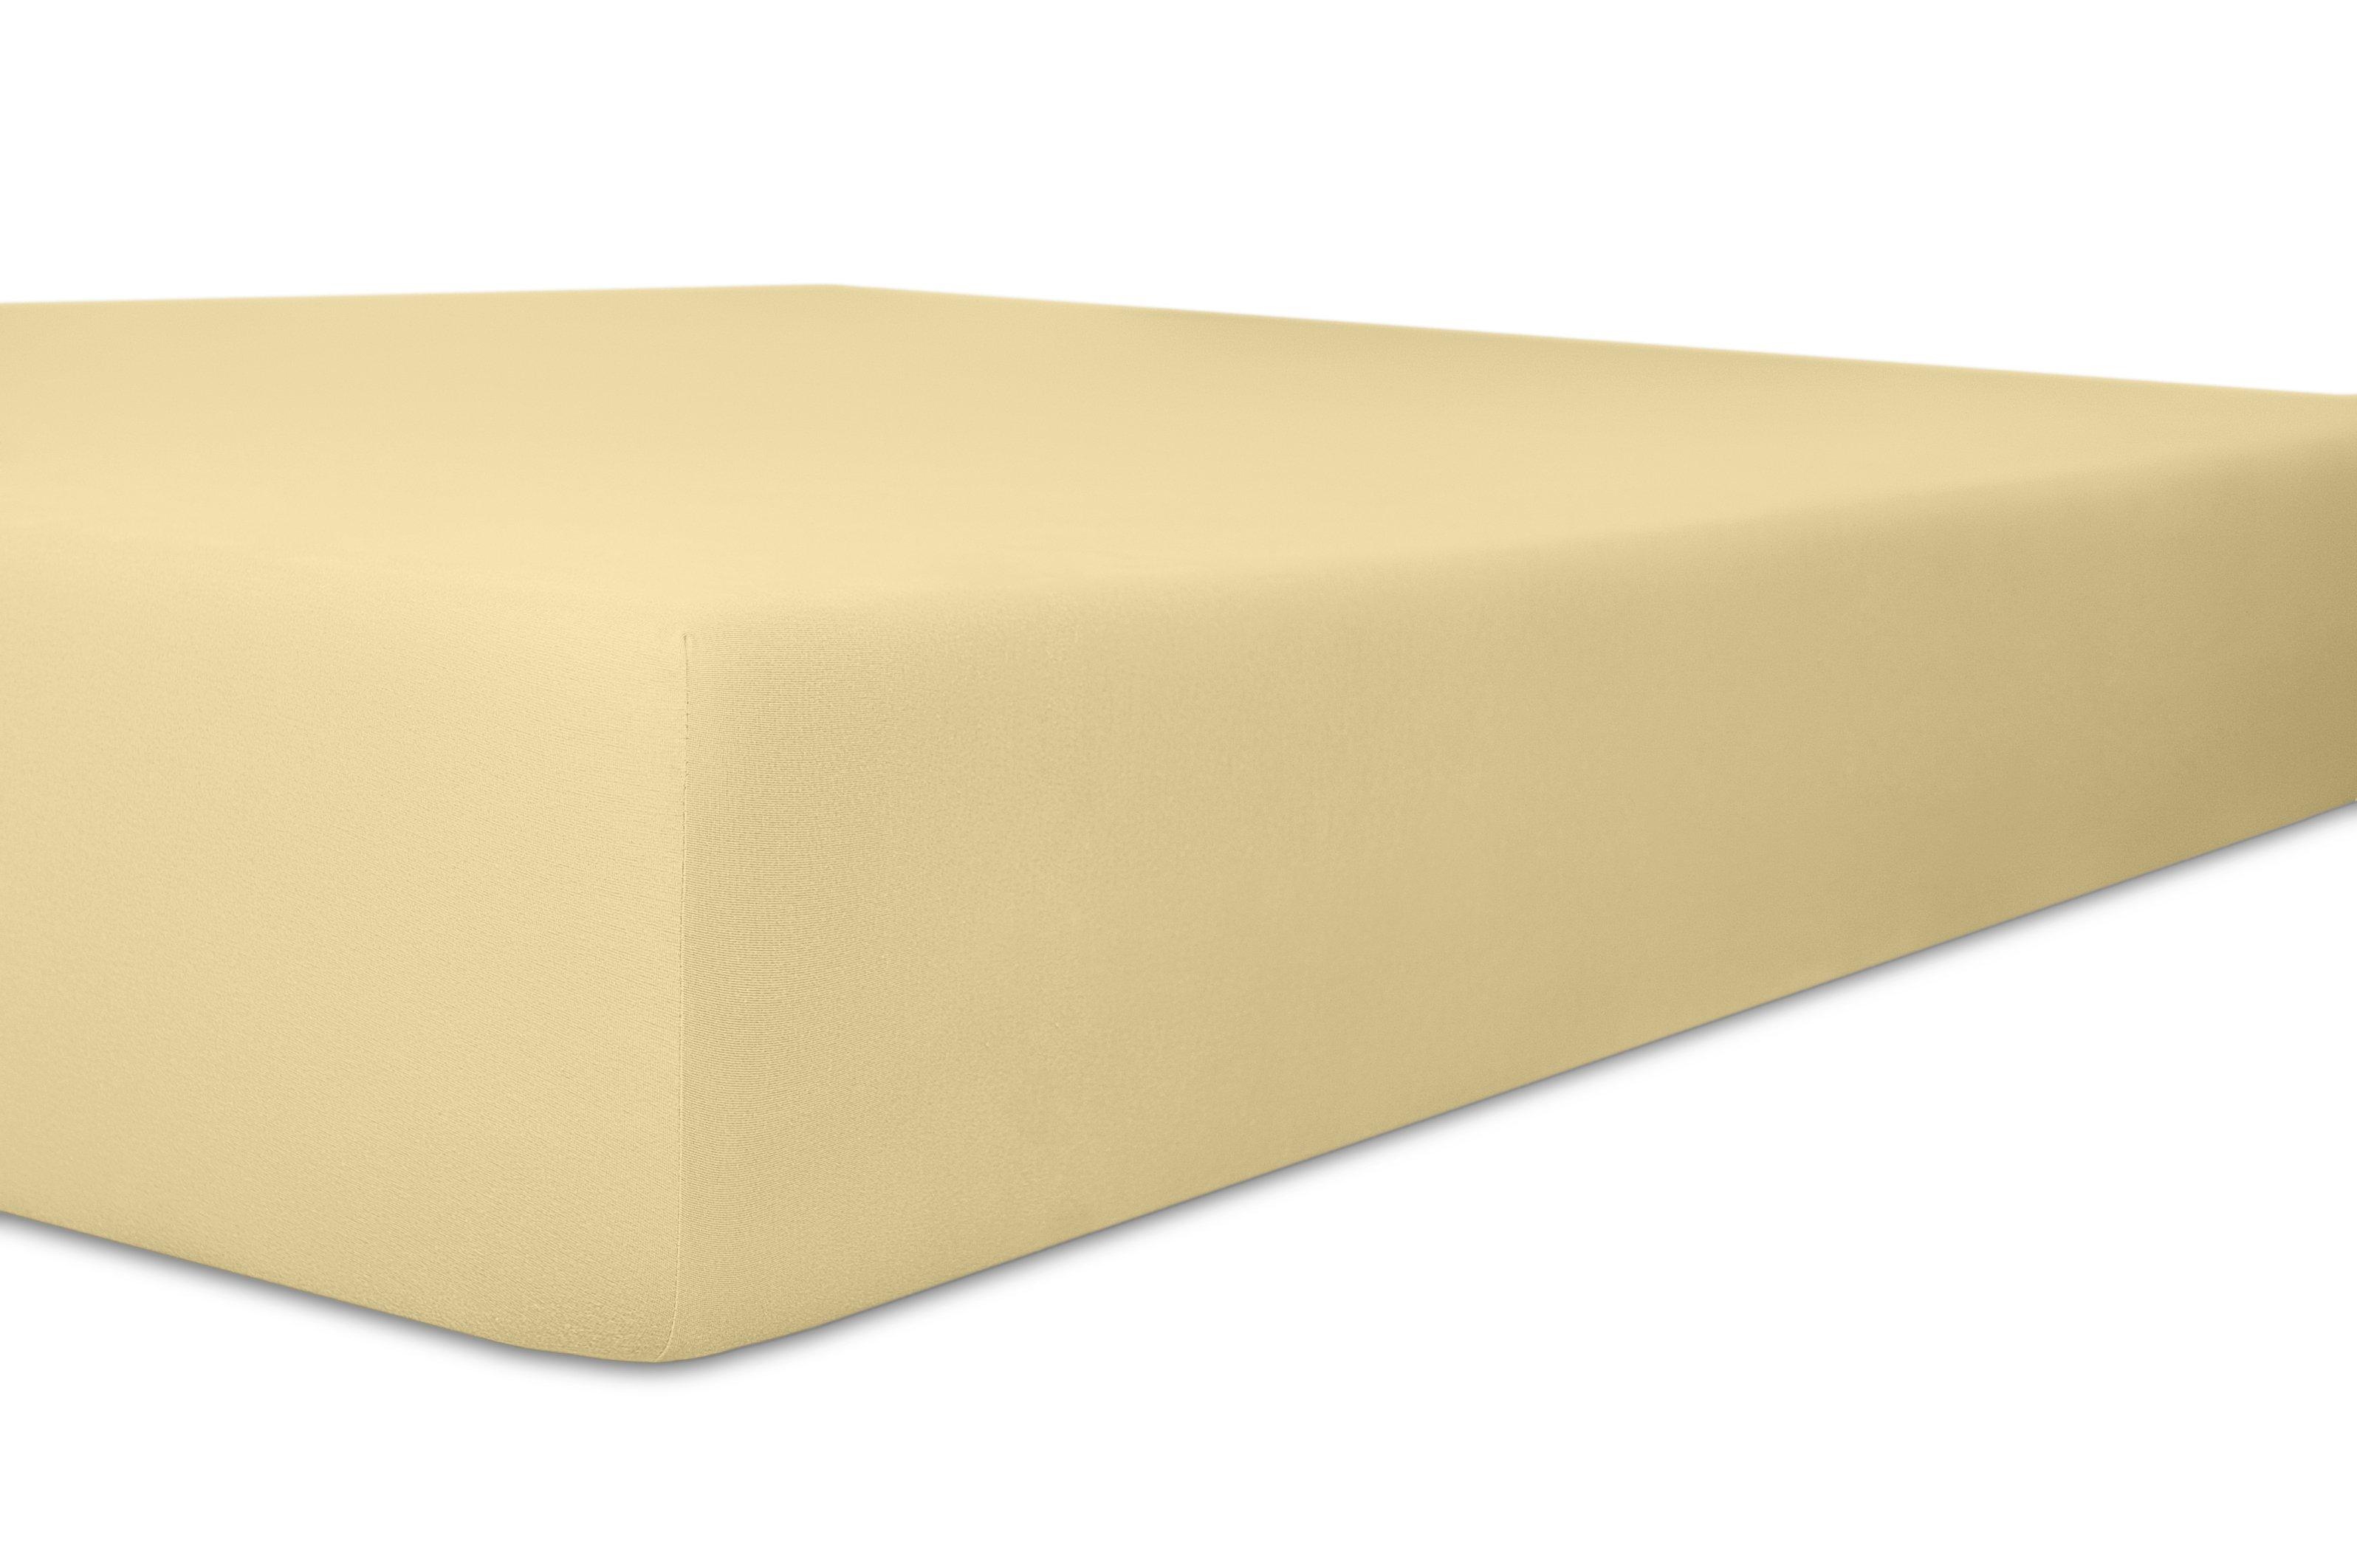 Spannbetttuch Standard kiesel 50% Baumwolle / 45% Modal / 5% Elasthan